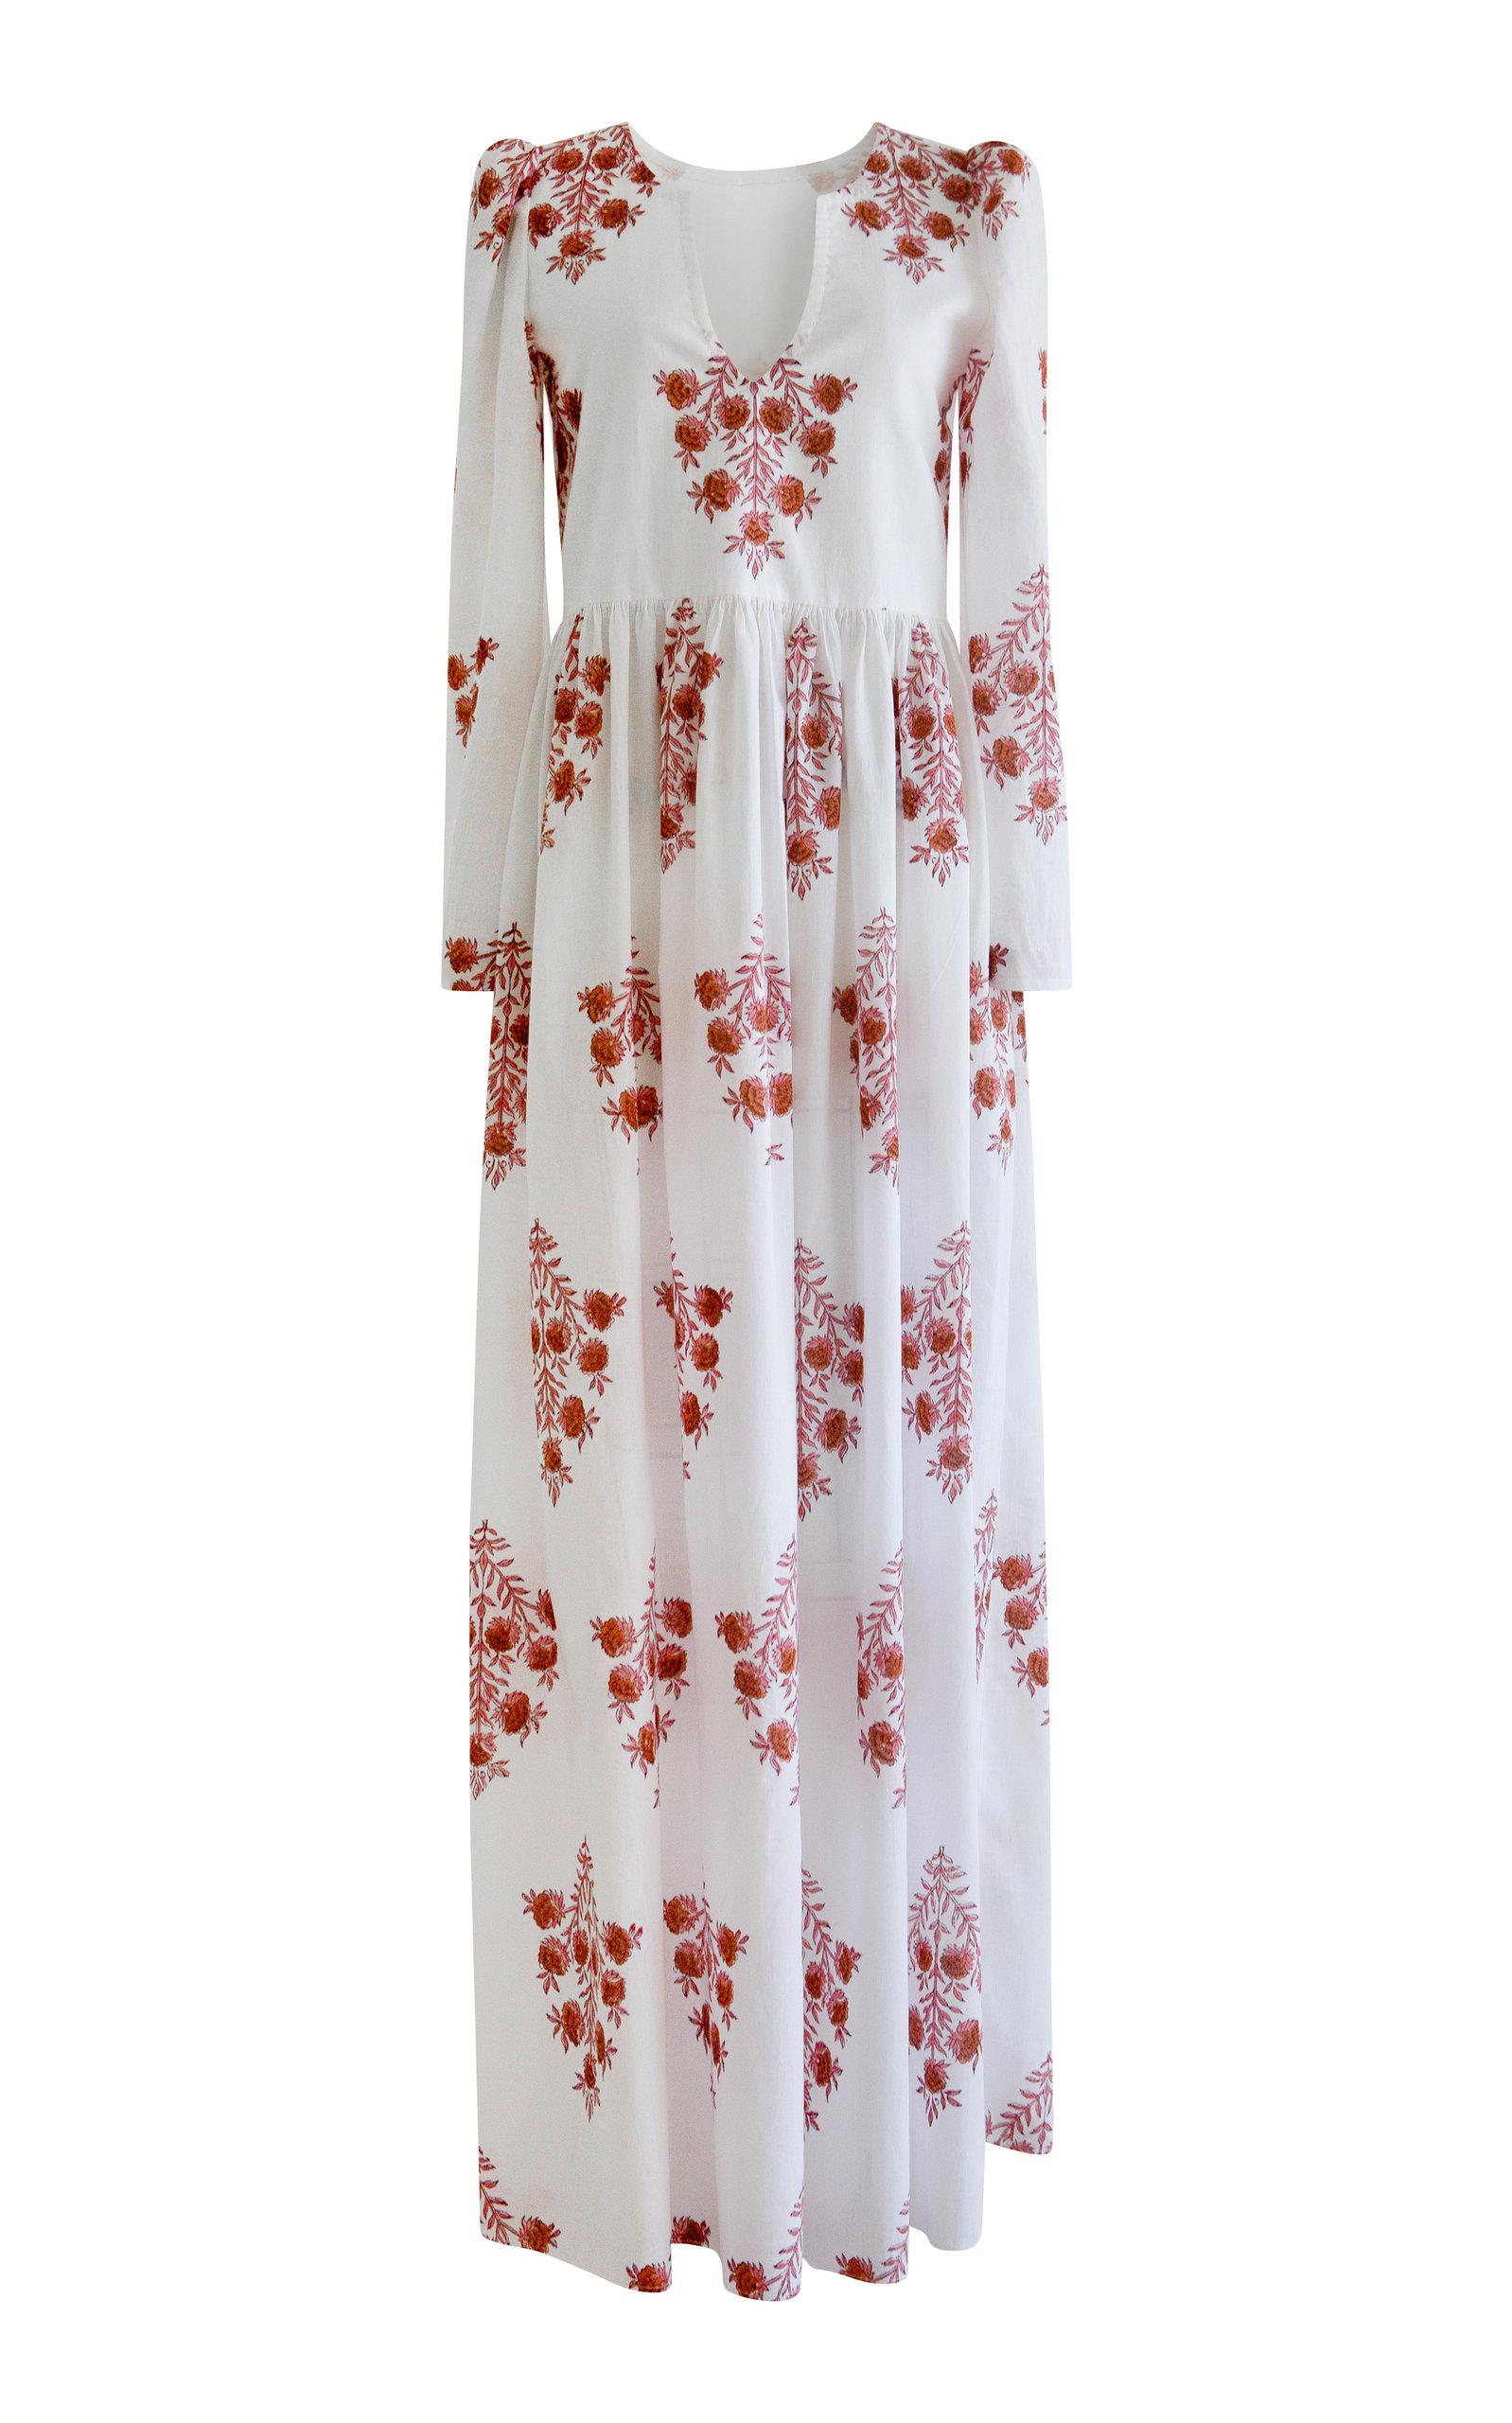 Alix of Bohemia - Women's Savannah Dahlia Print Dress - Print - Moda Operandi